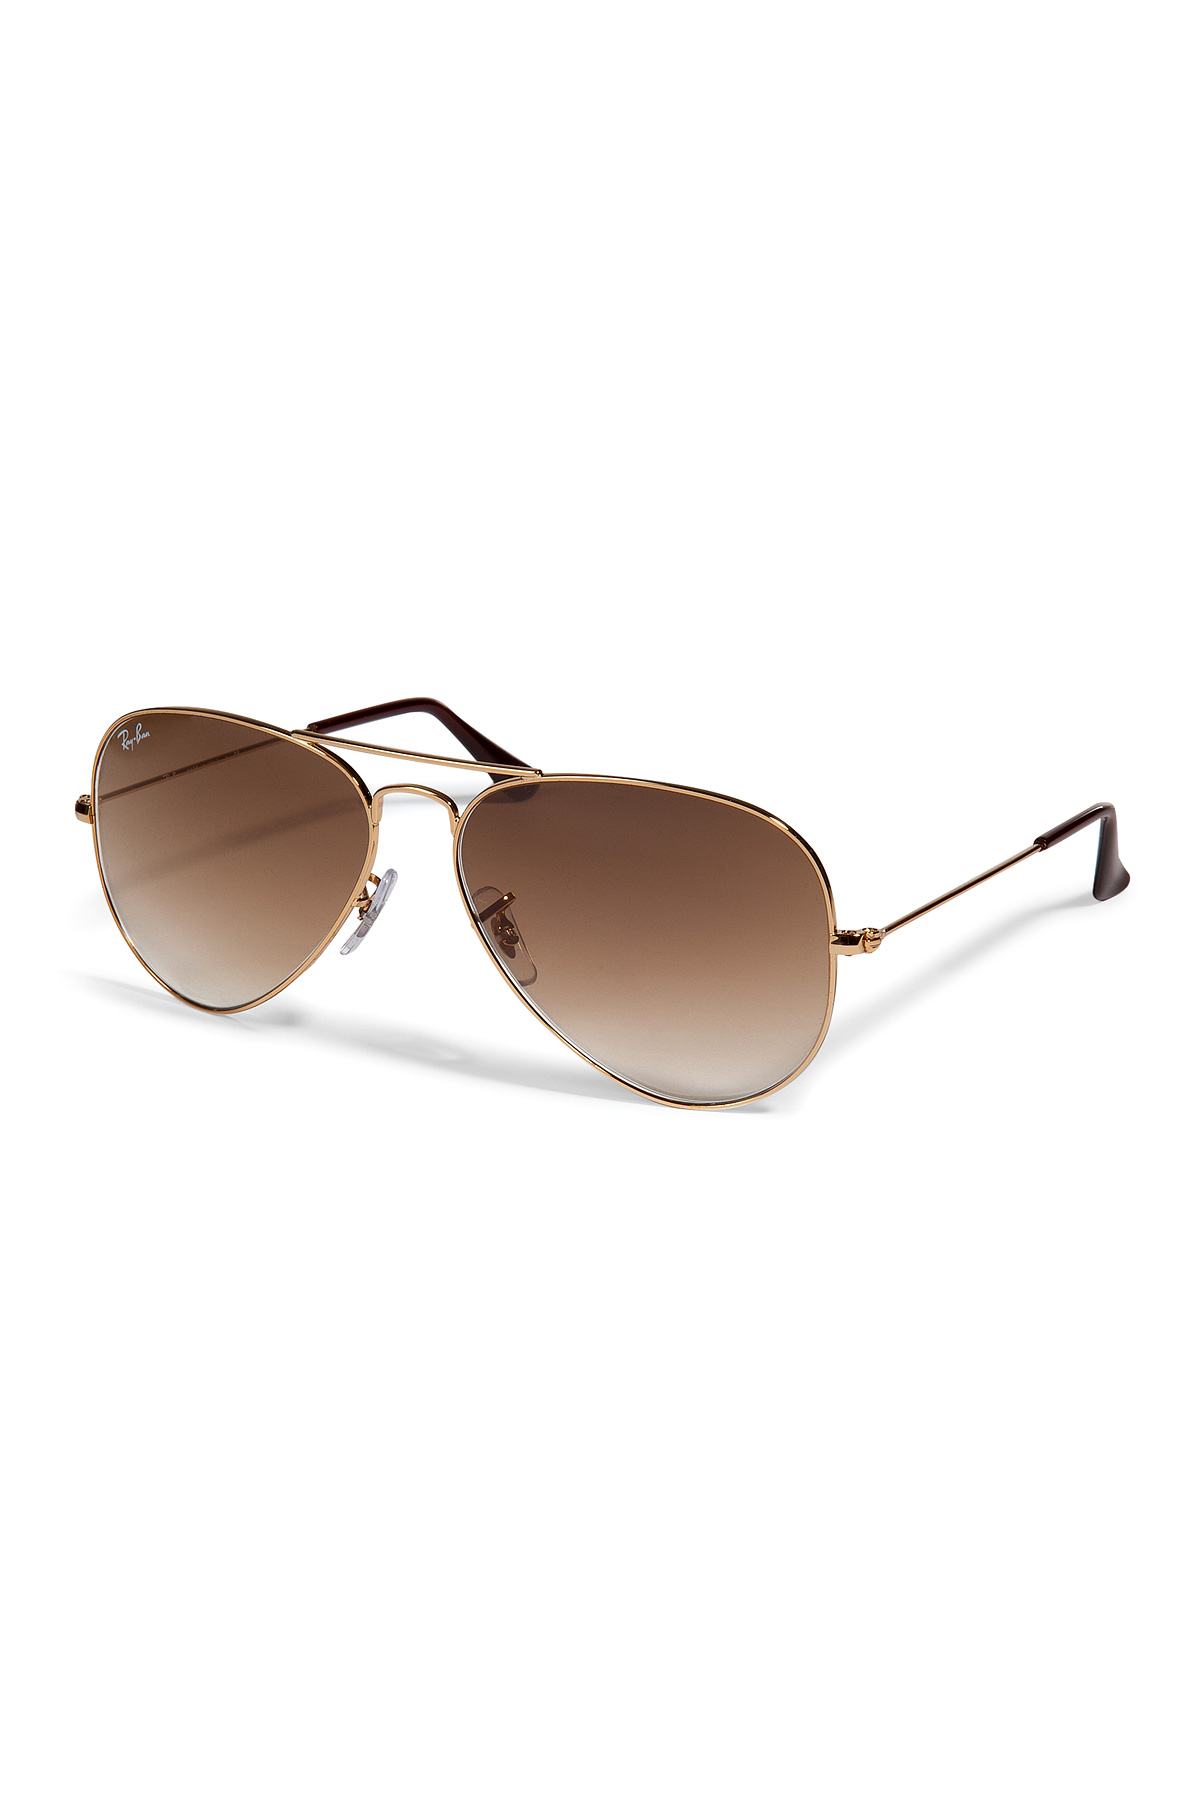 Ray Ban Metal Aviator Gradient Sunglasses Multicolor In